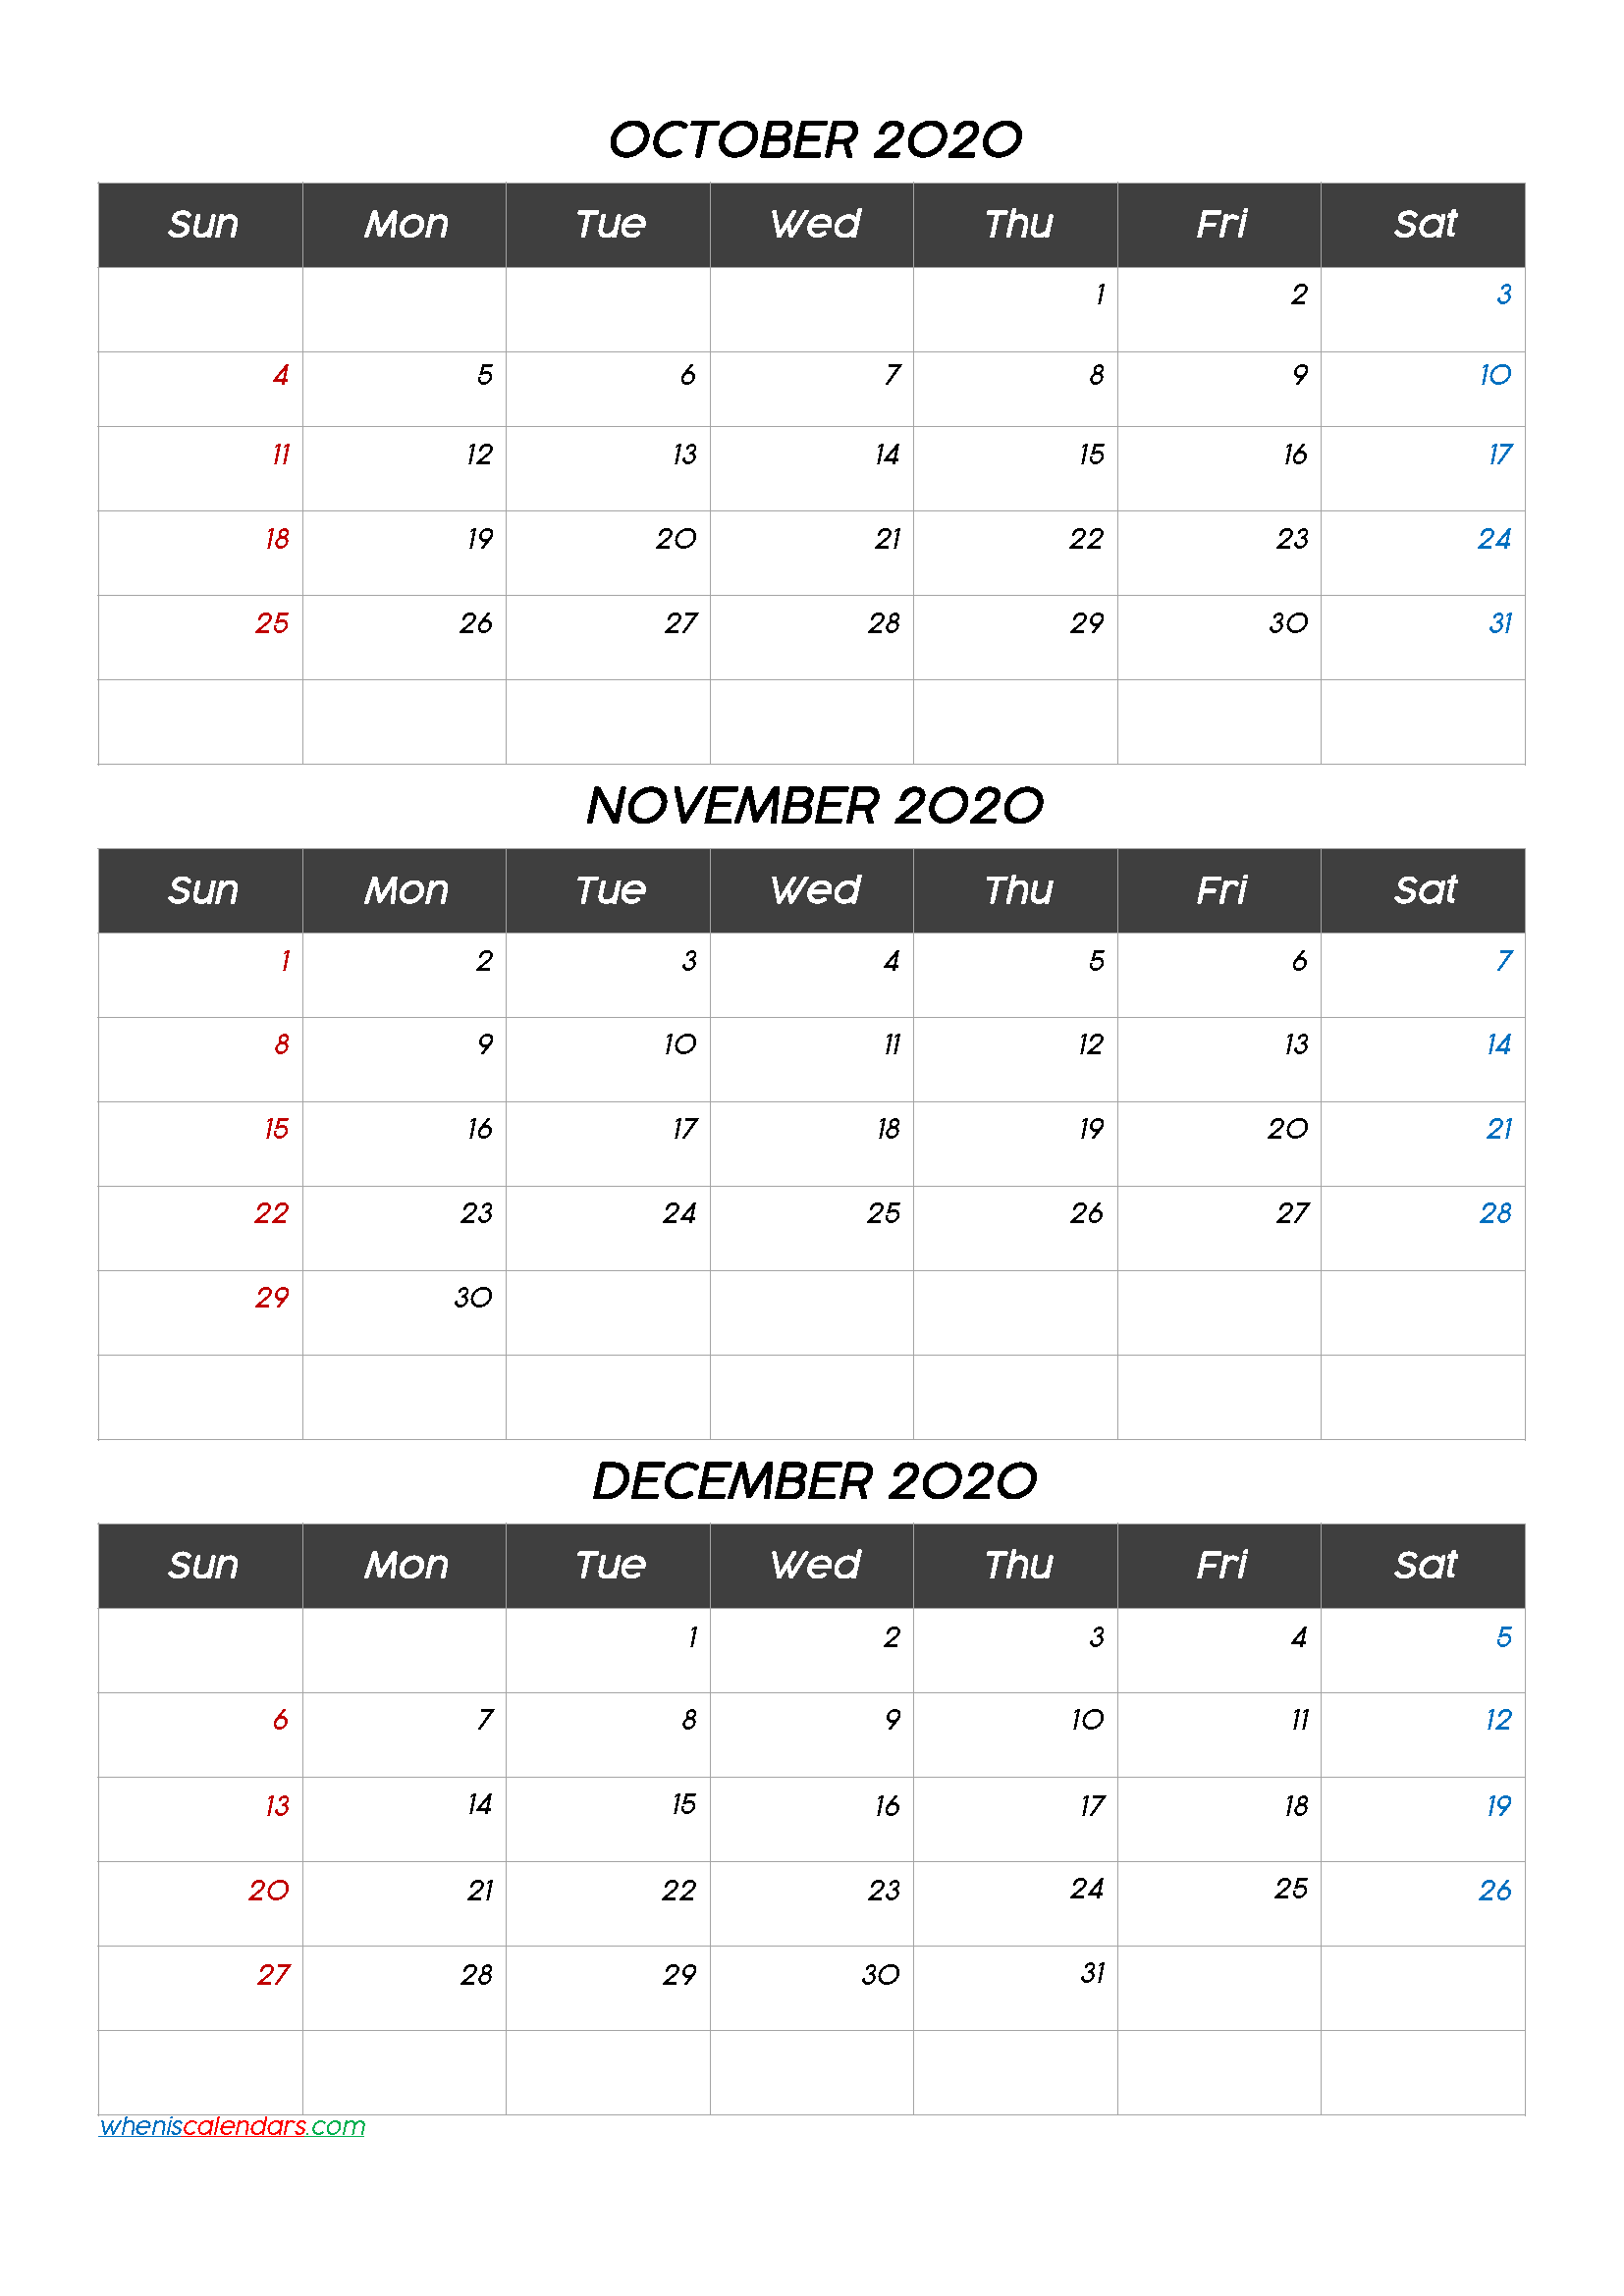 Free Printable 3 Month Calendar2020 October November December